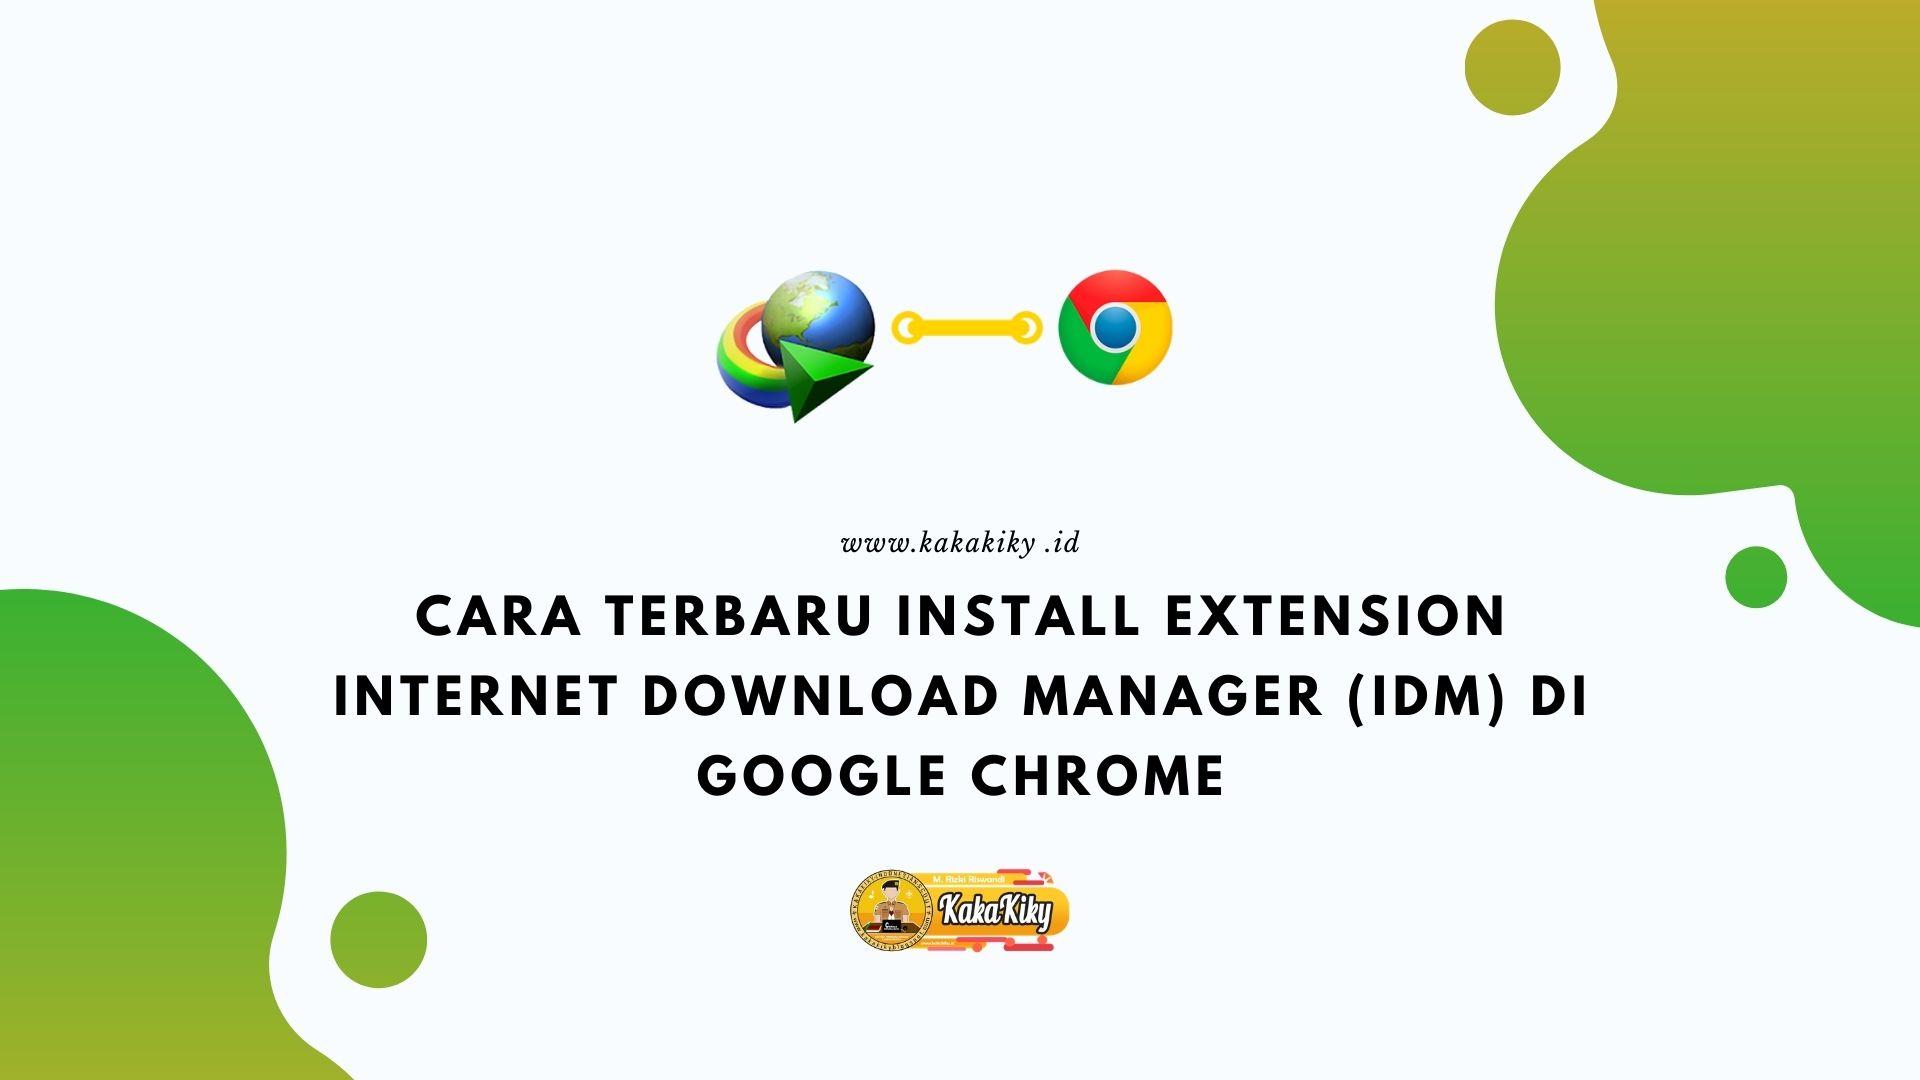 Cara Terbaru Install Extension Internet Download Manager Idm Di Google Chrome Kakakiky Blog Edukasi